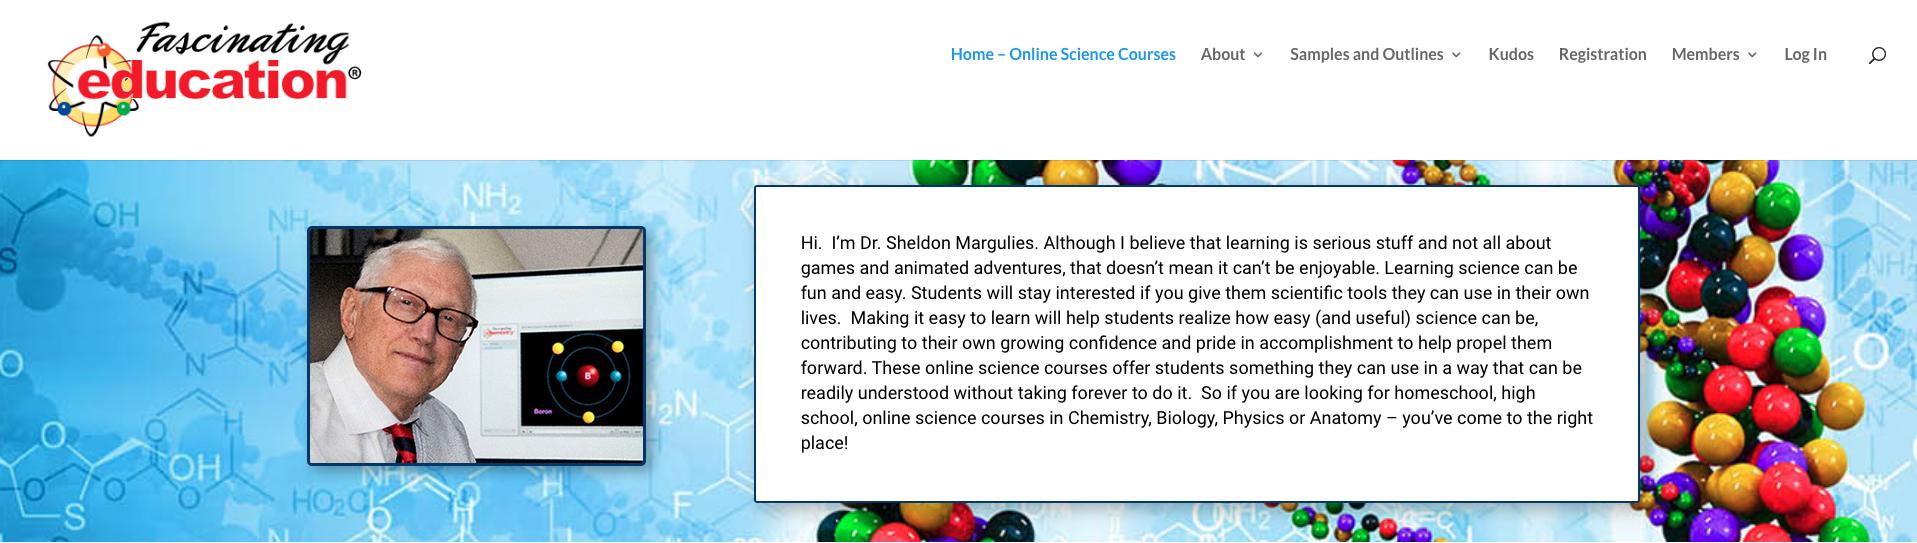 Fascinating Education Science Homeschool Curriculum